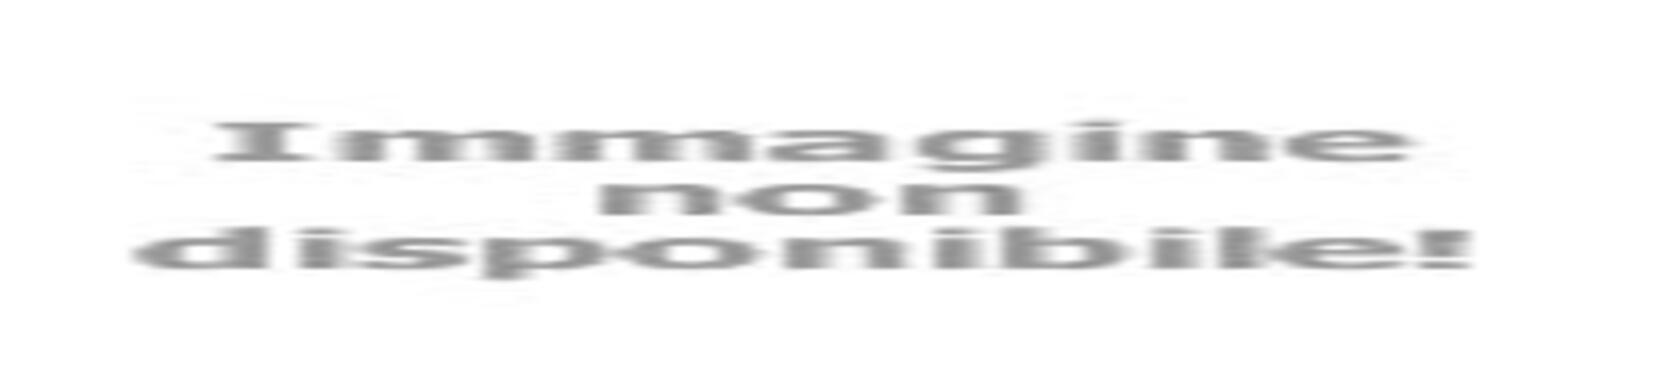 basketriminicrabs it 6-2716-video-eybl-u20-i-tappa-szczecin-crabs 005